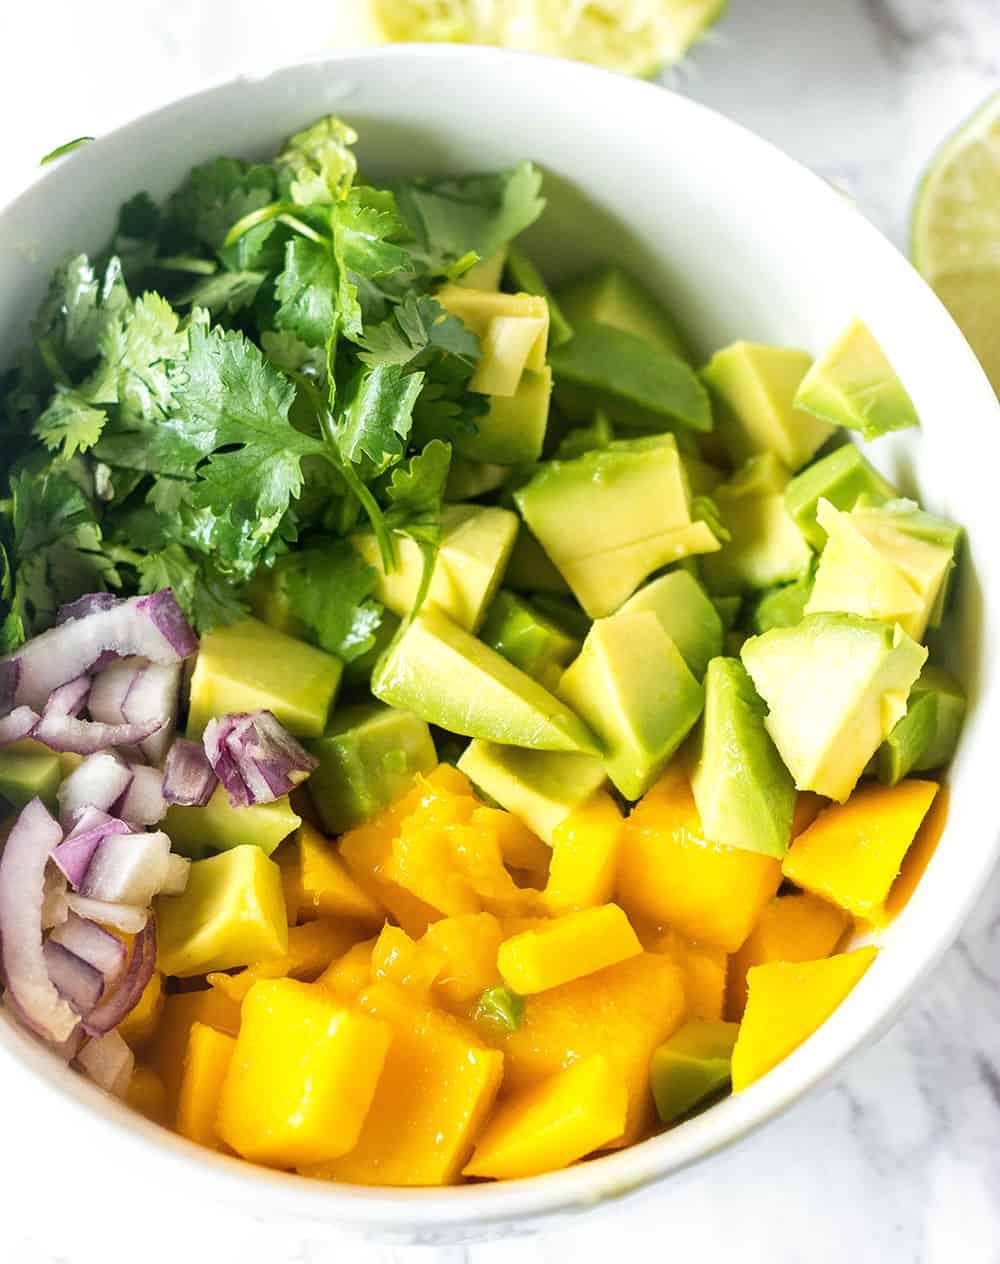 Mango Avocado Salsa Ingredients in a white bowl